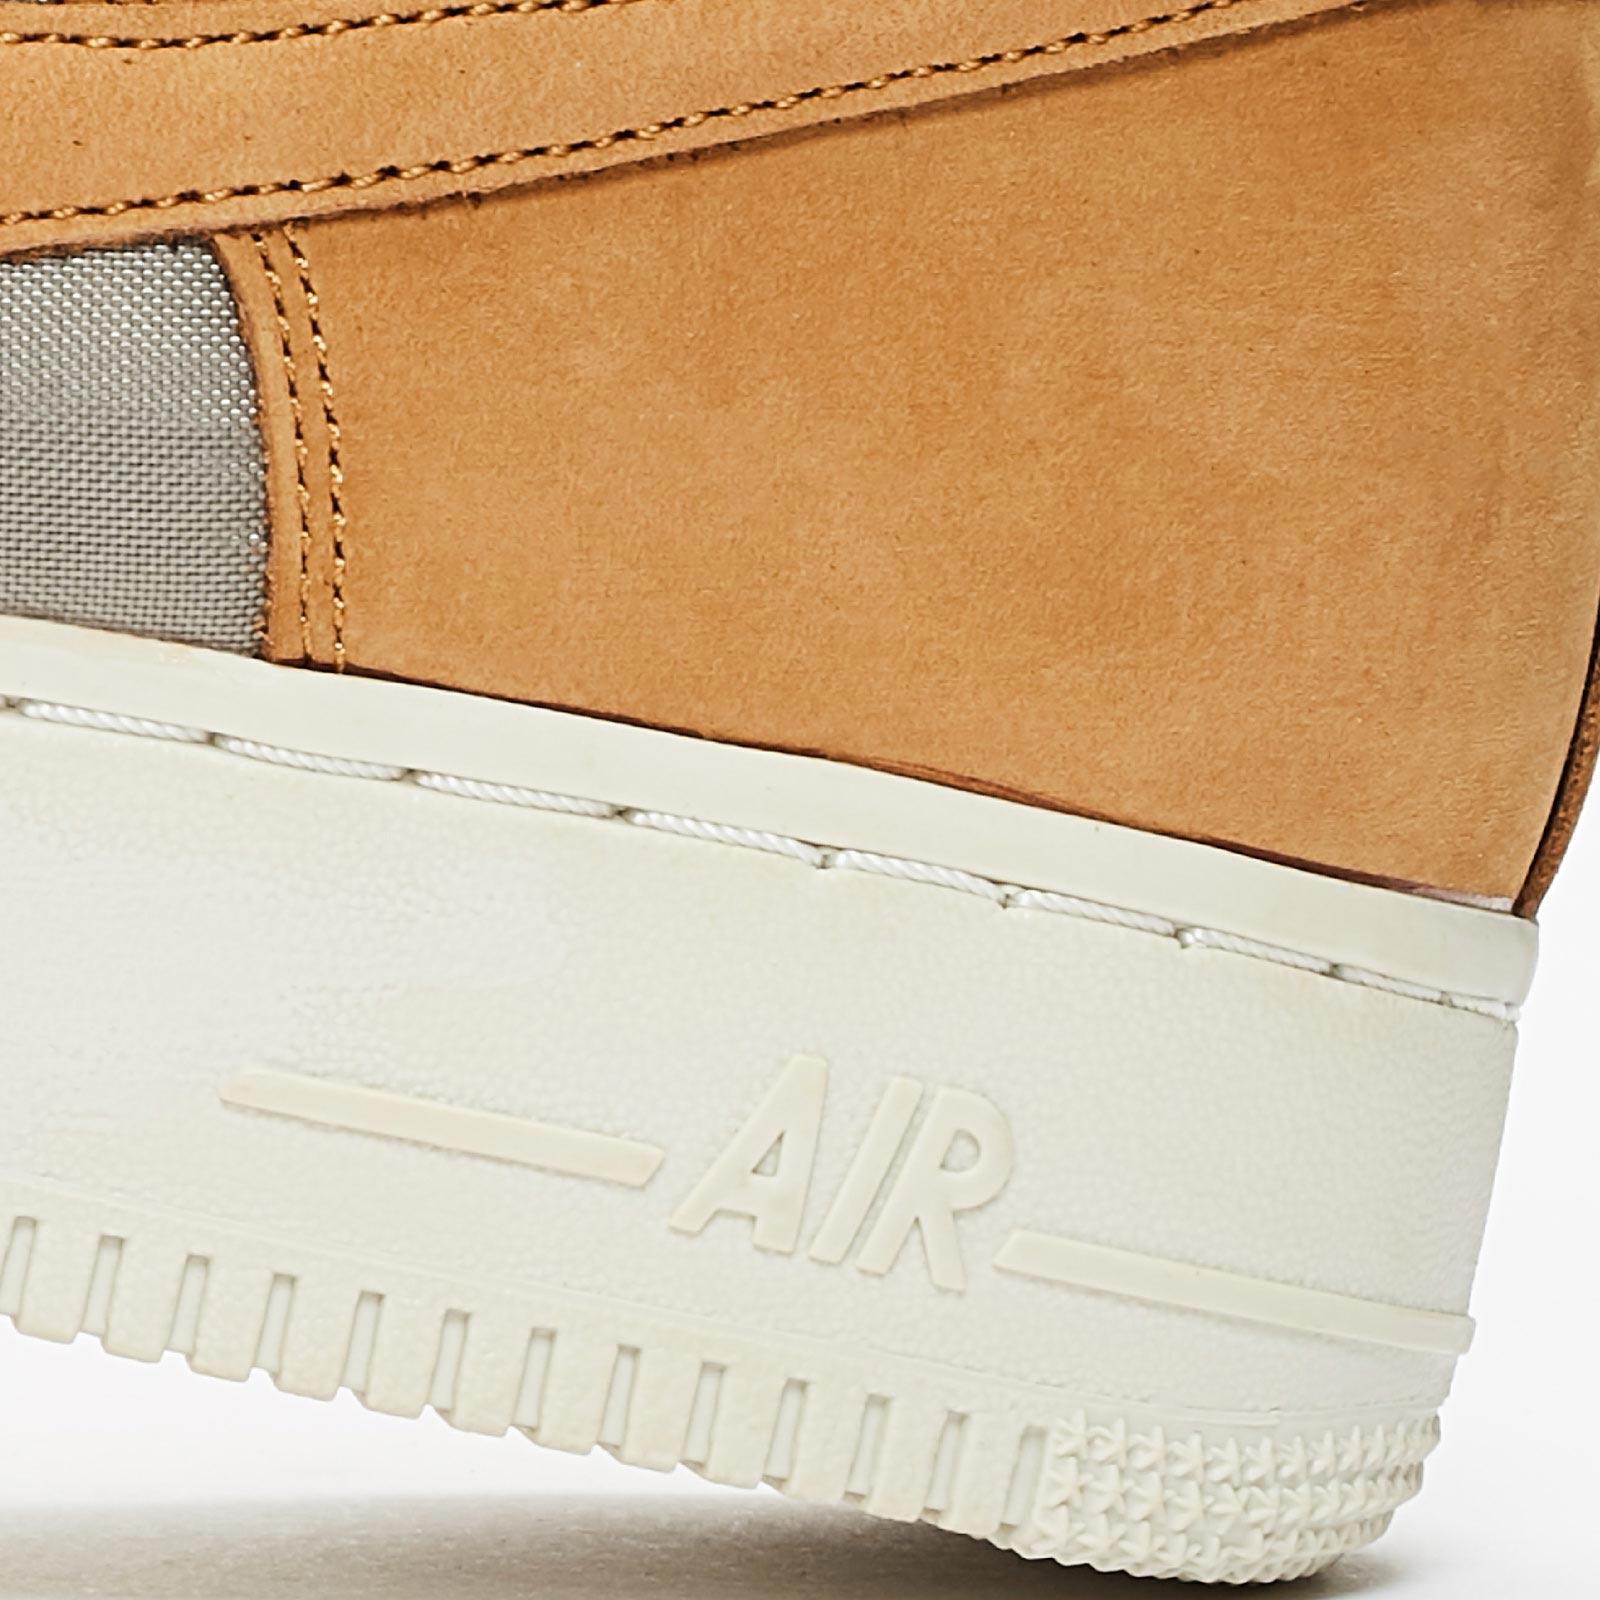 premium selection 800ed de149 Nike Sportswear Air Force 1 High 07 Premium - 7. Schließen